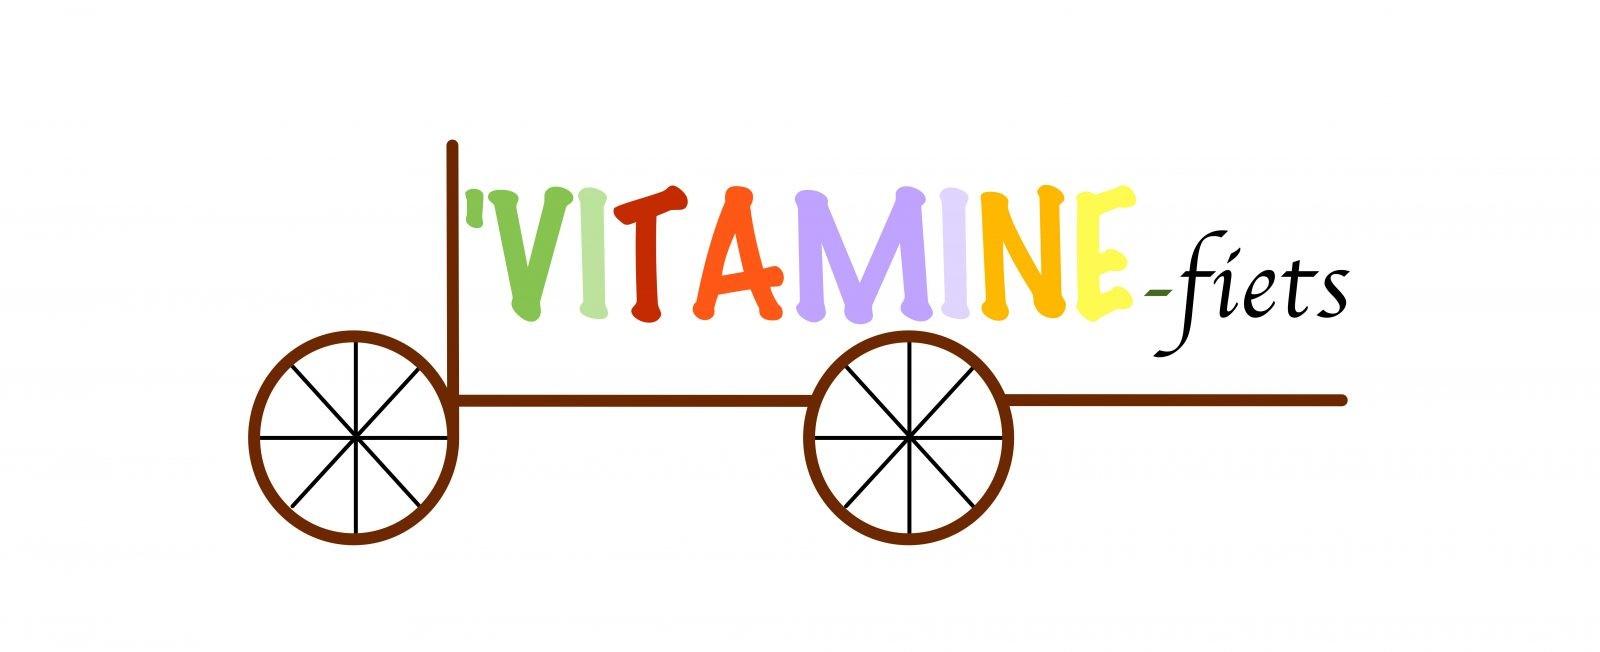 Vitamine-fiets